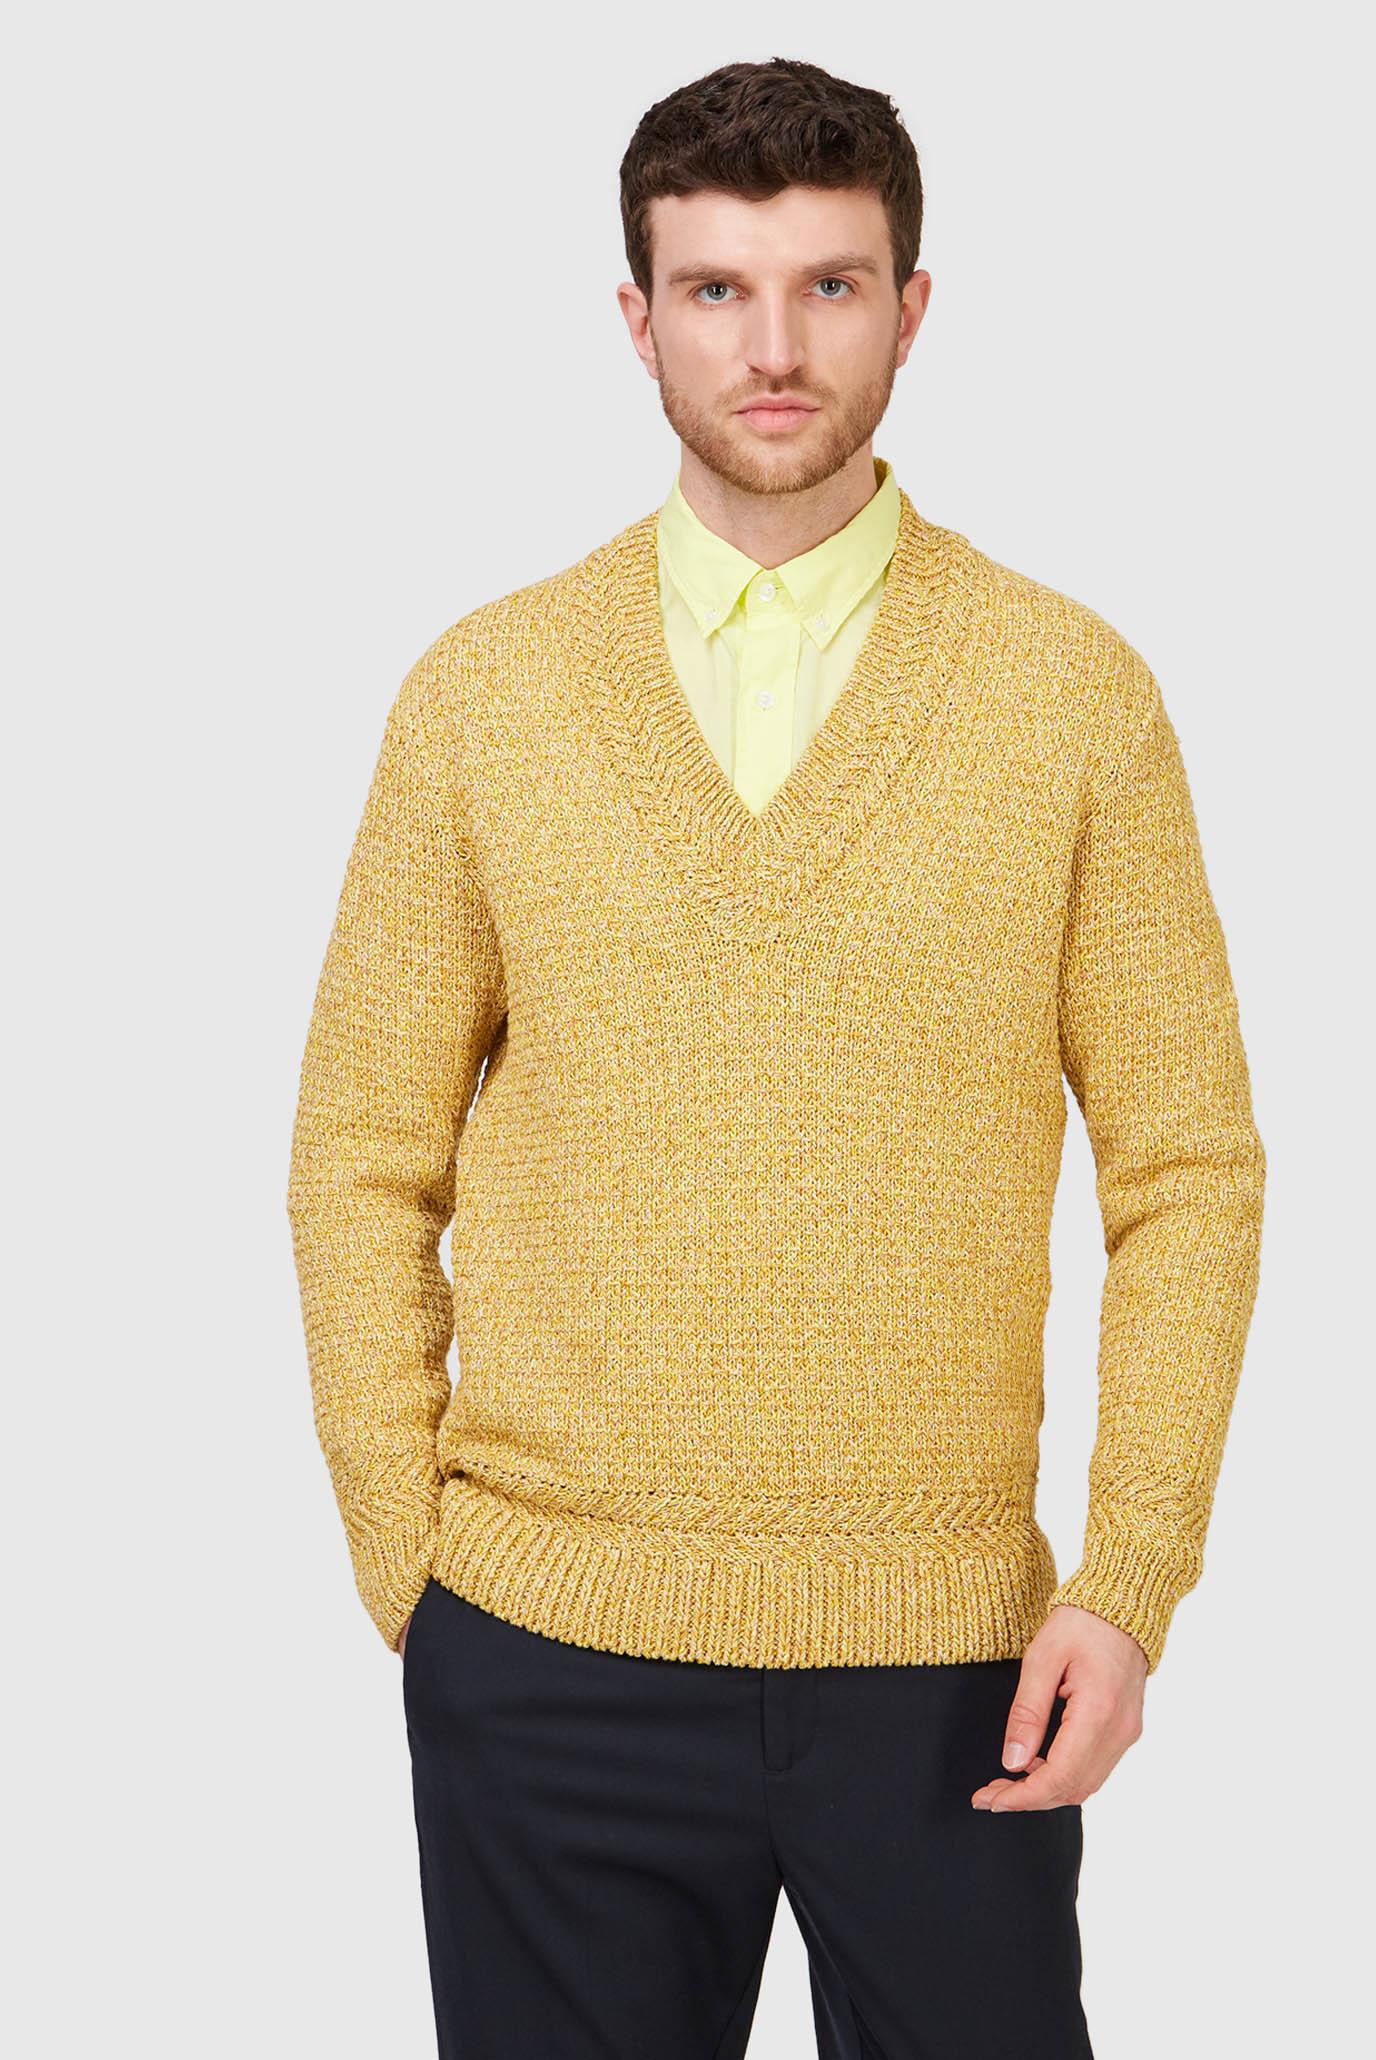 Мужской горчичный пуловер TWISTED 1